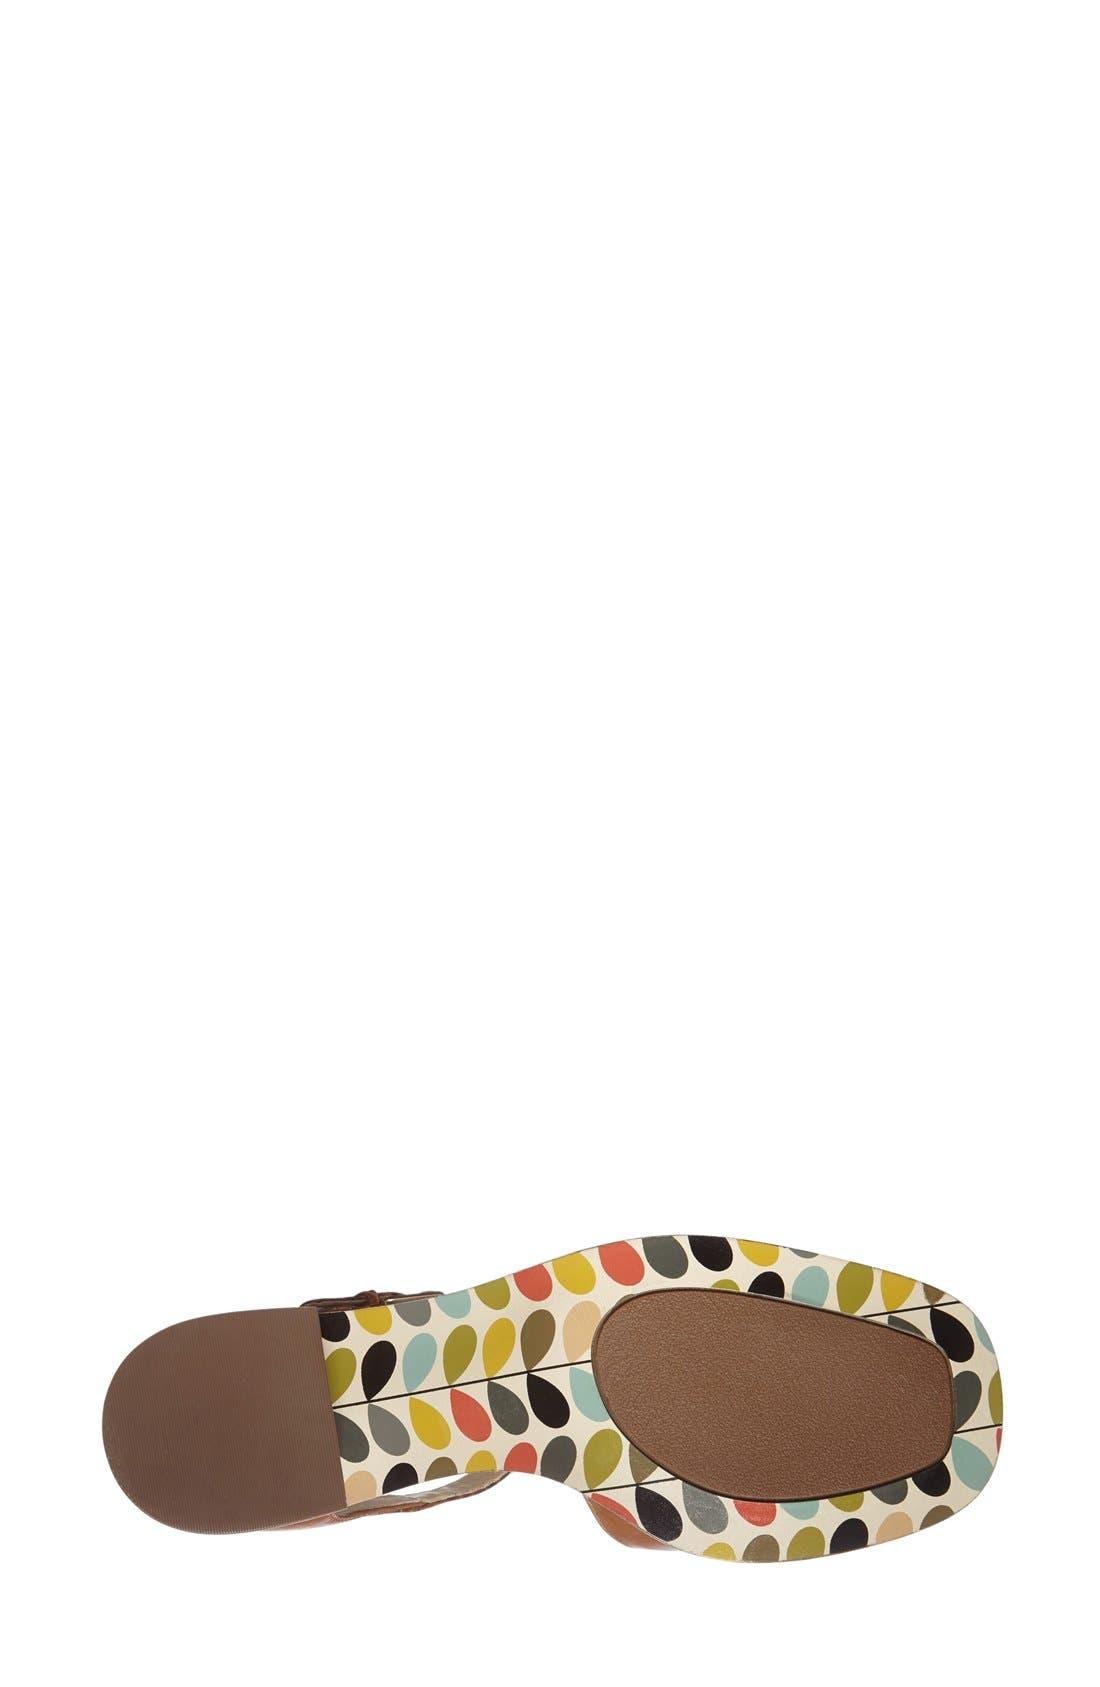 Clarks<sup>®</sup> x Orla Kiely 'Bibi' Leather T-Strap Sandal,                             Alternate thumbnail 3, color,                             200